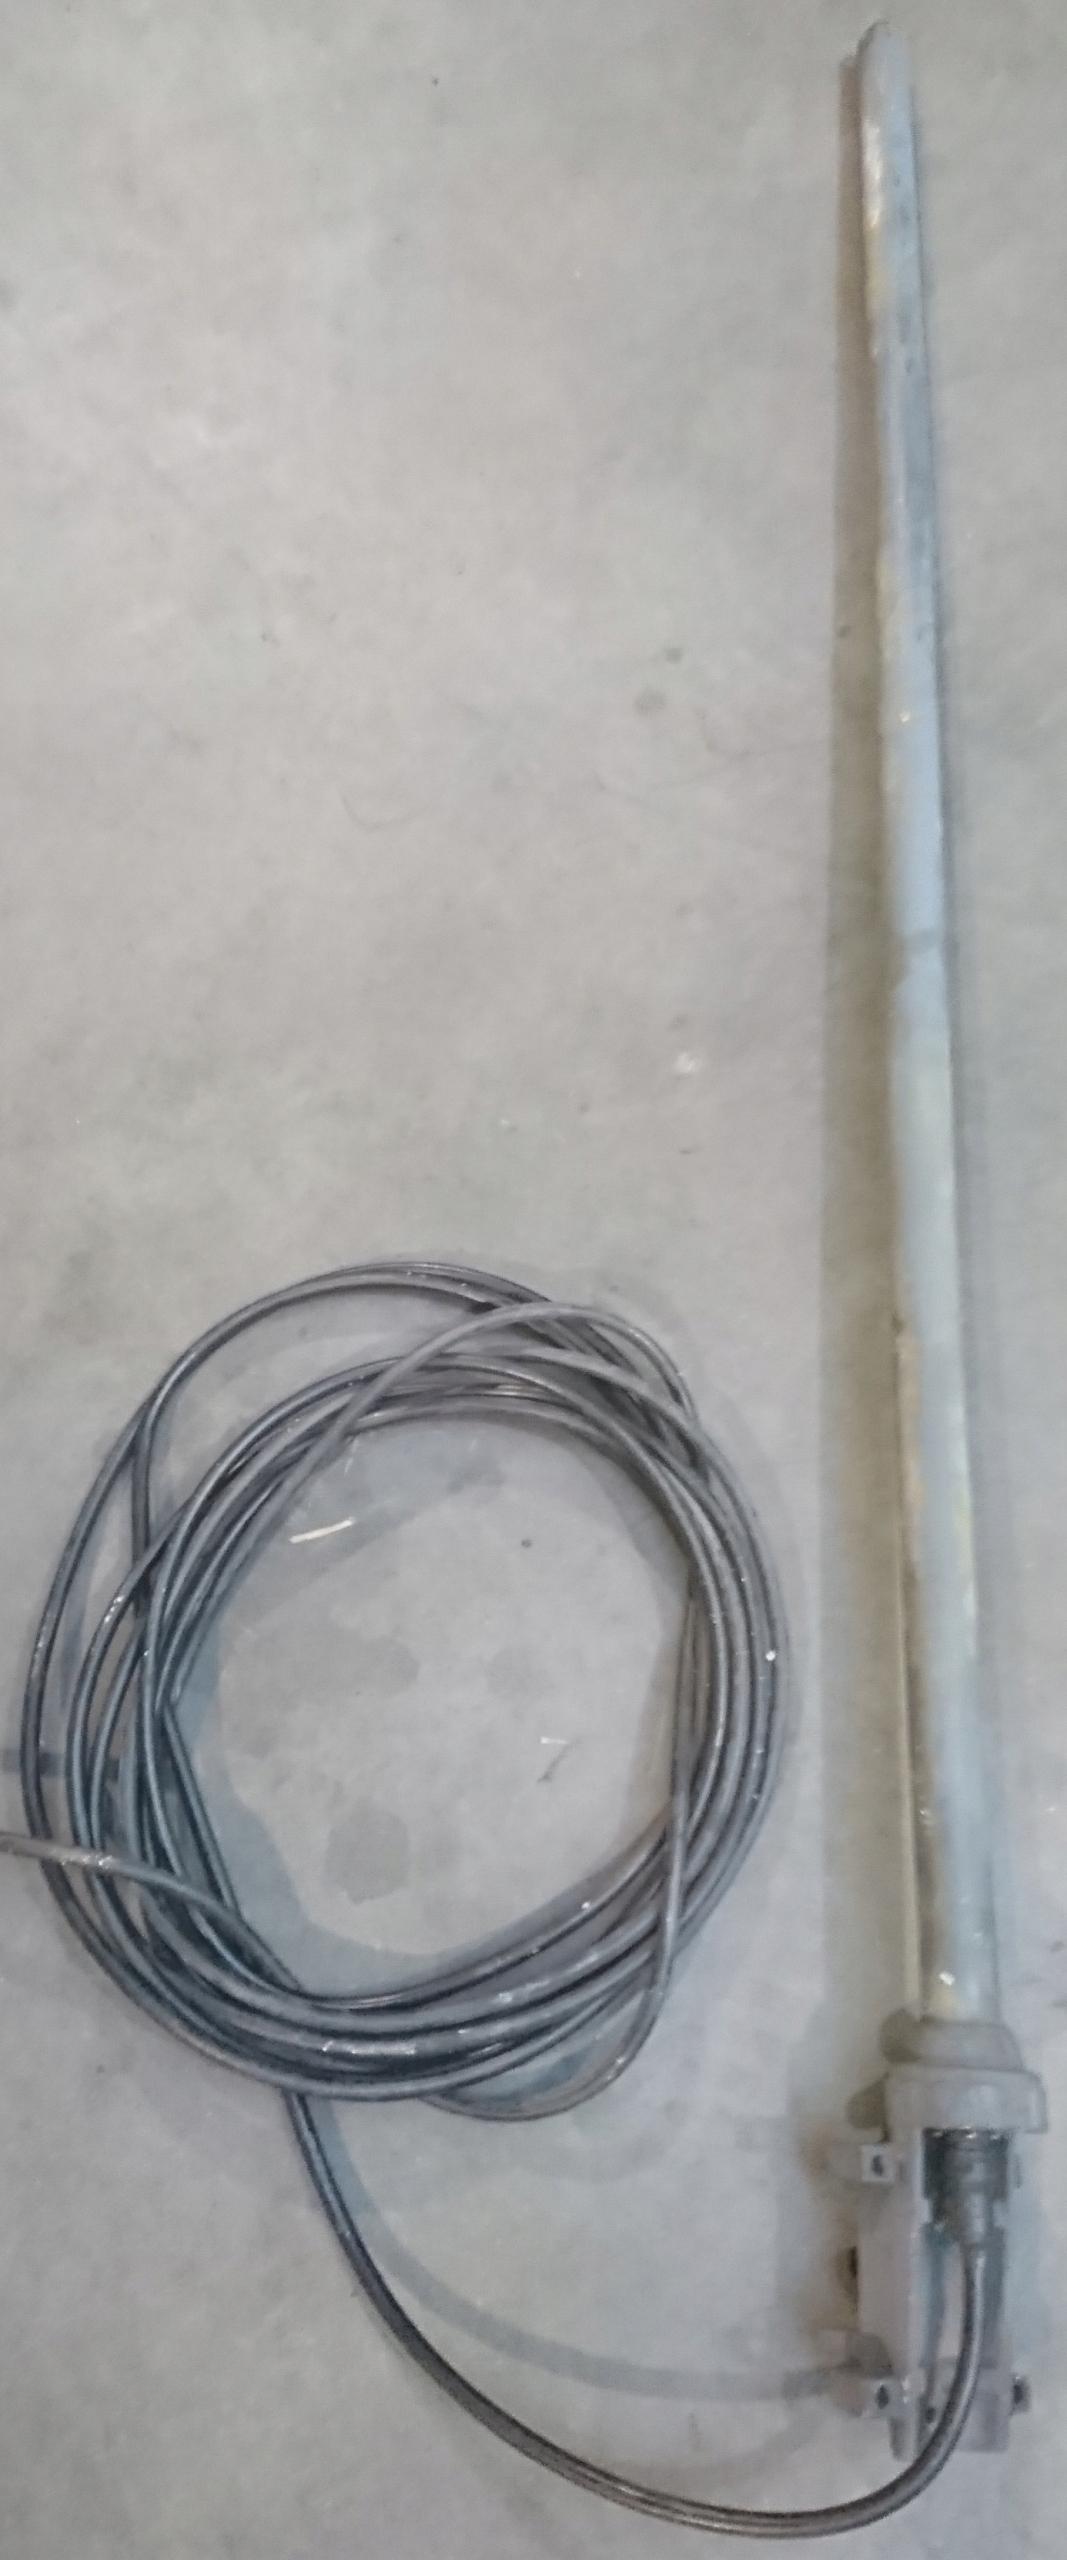 Antena bazowa TETRA do Motorola skaner inne